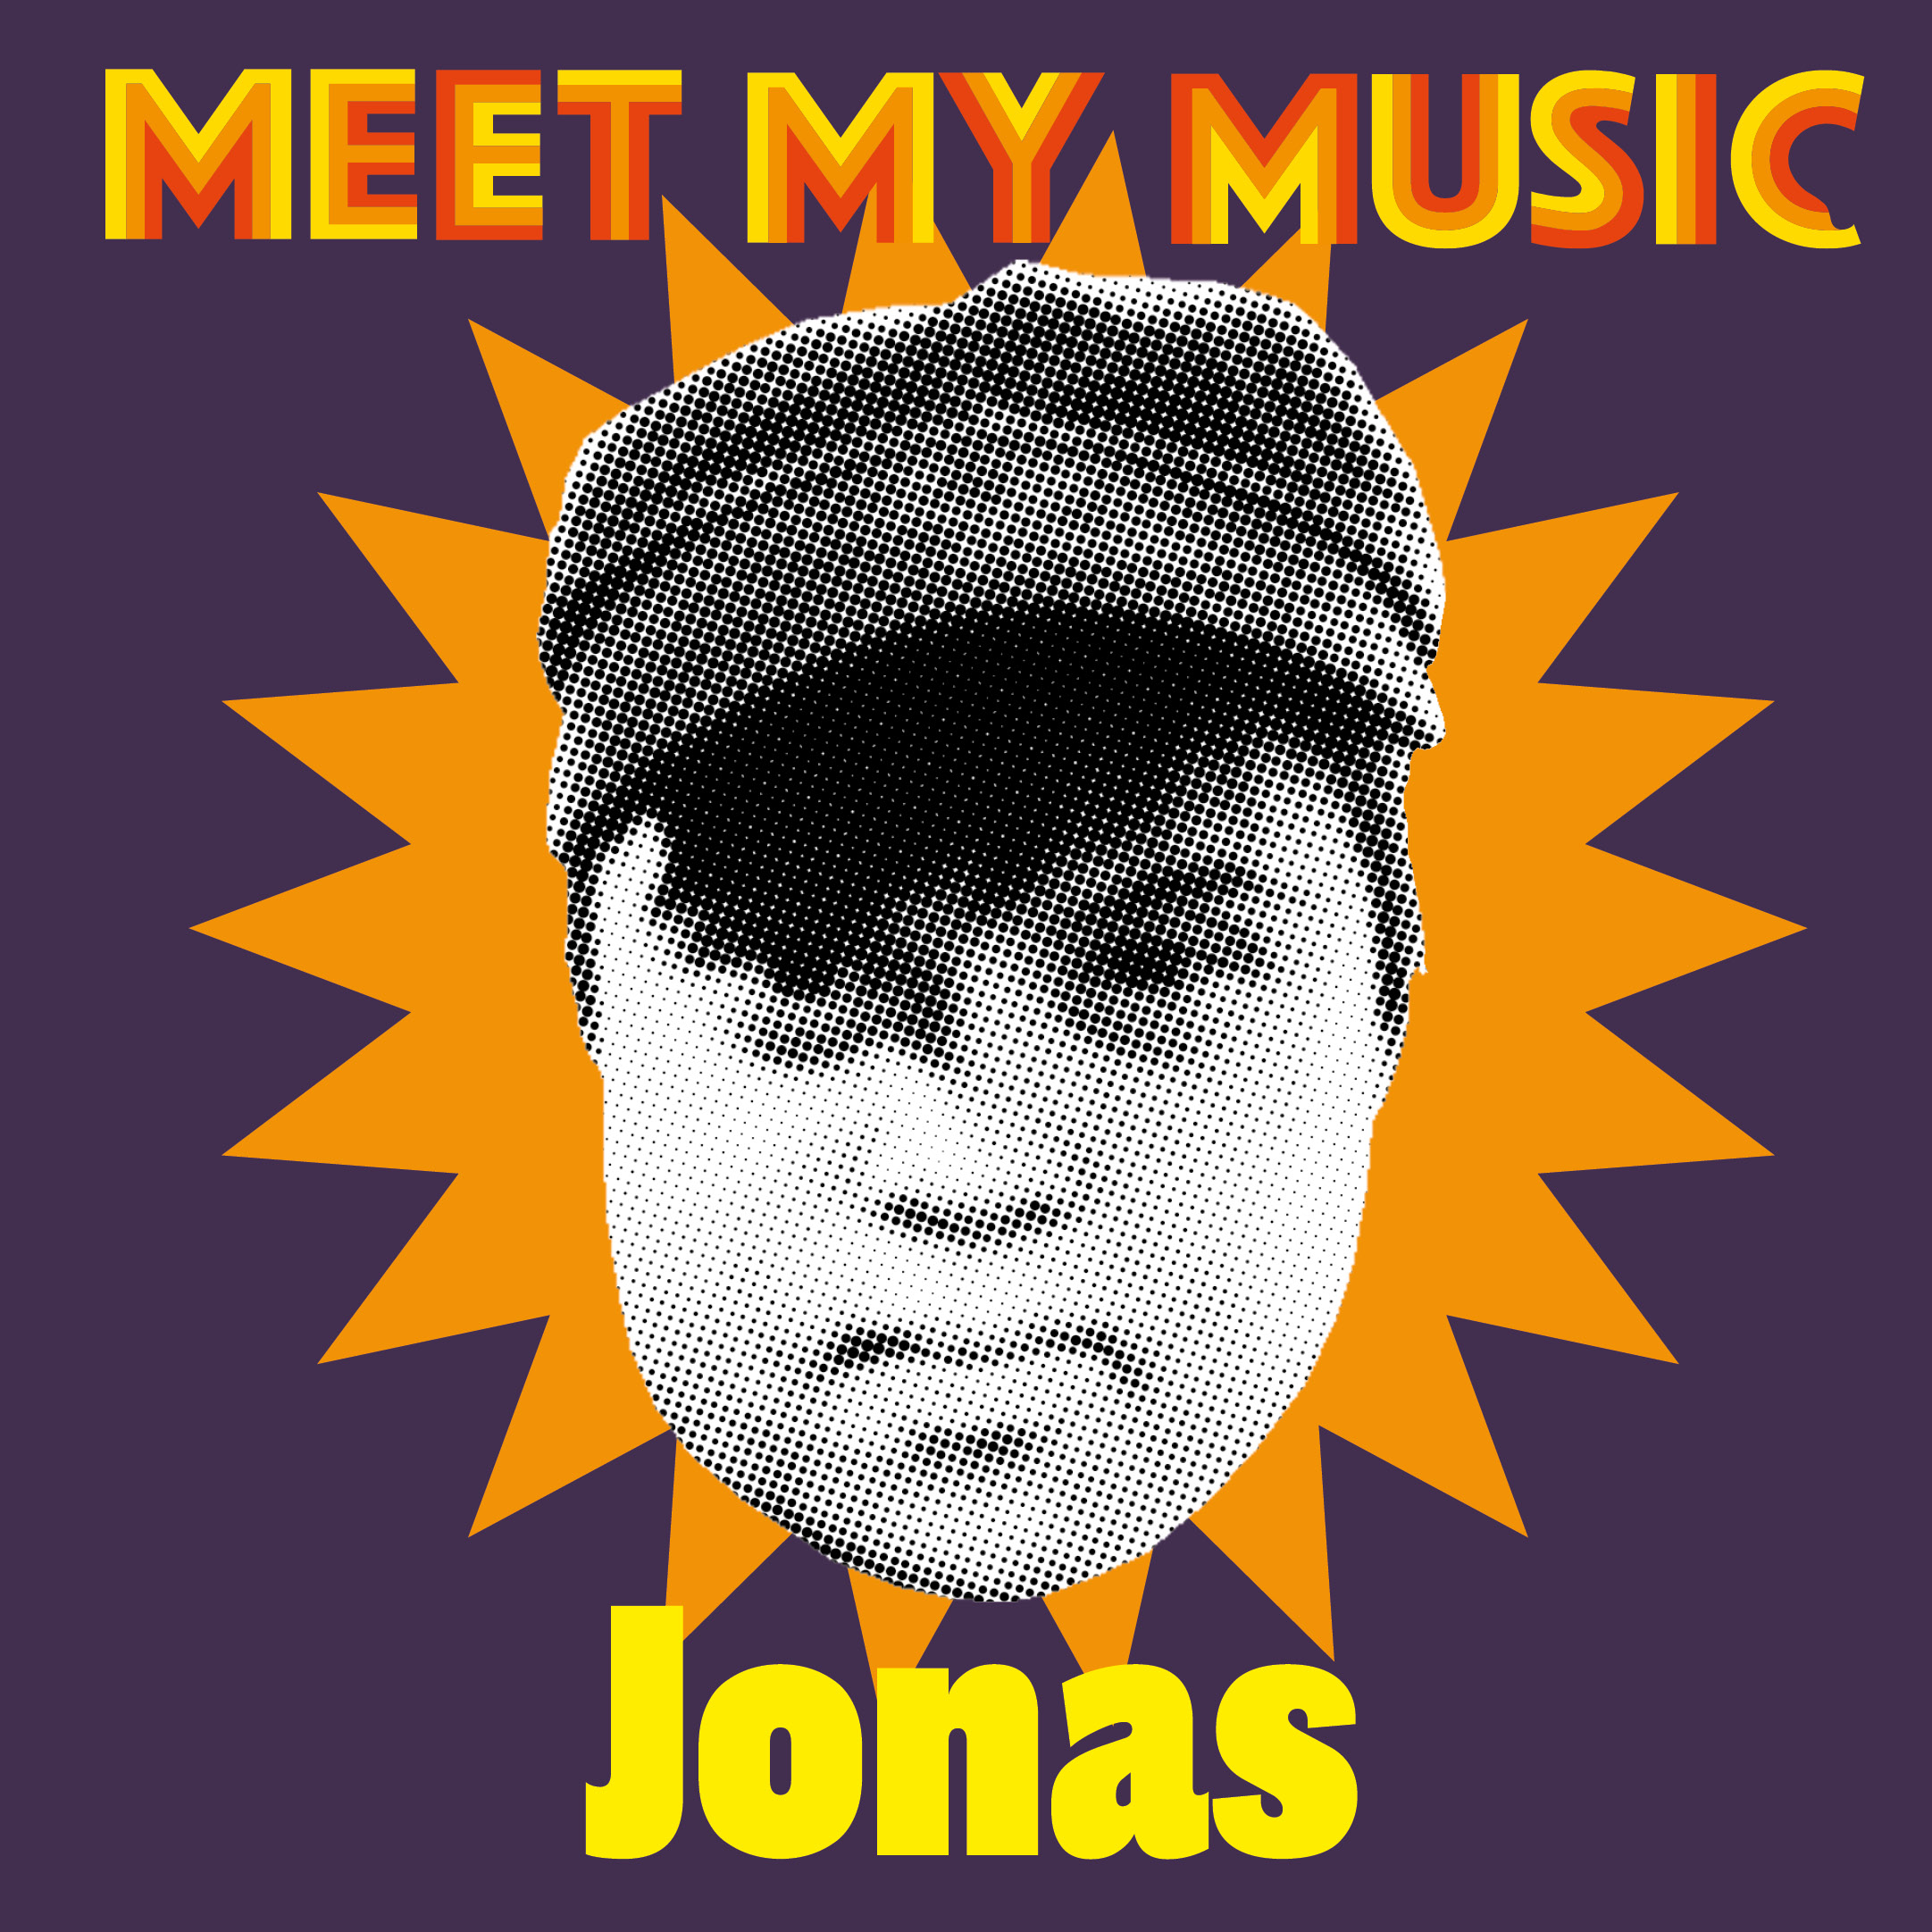 Meet my music Jonas 185.jpg